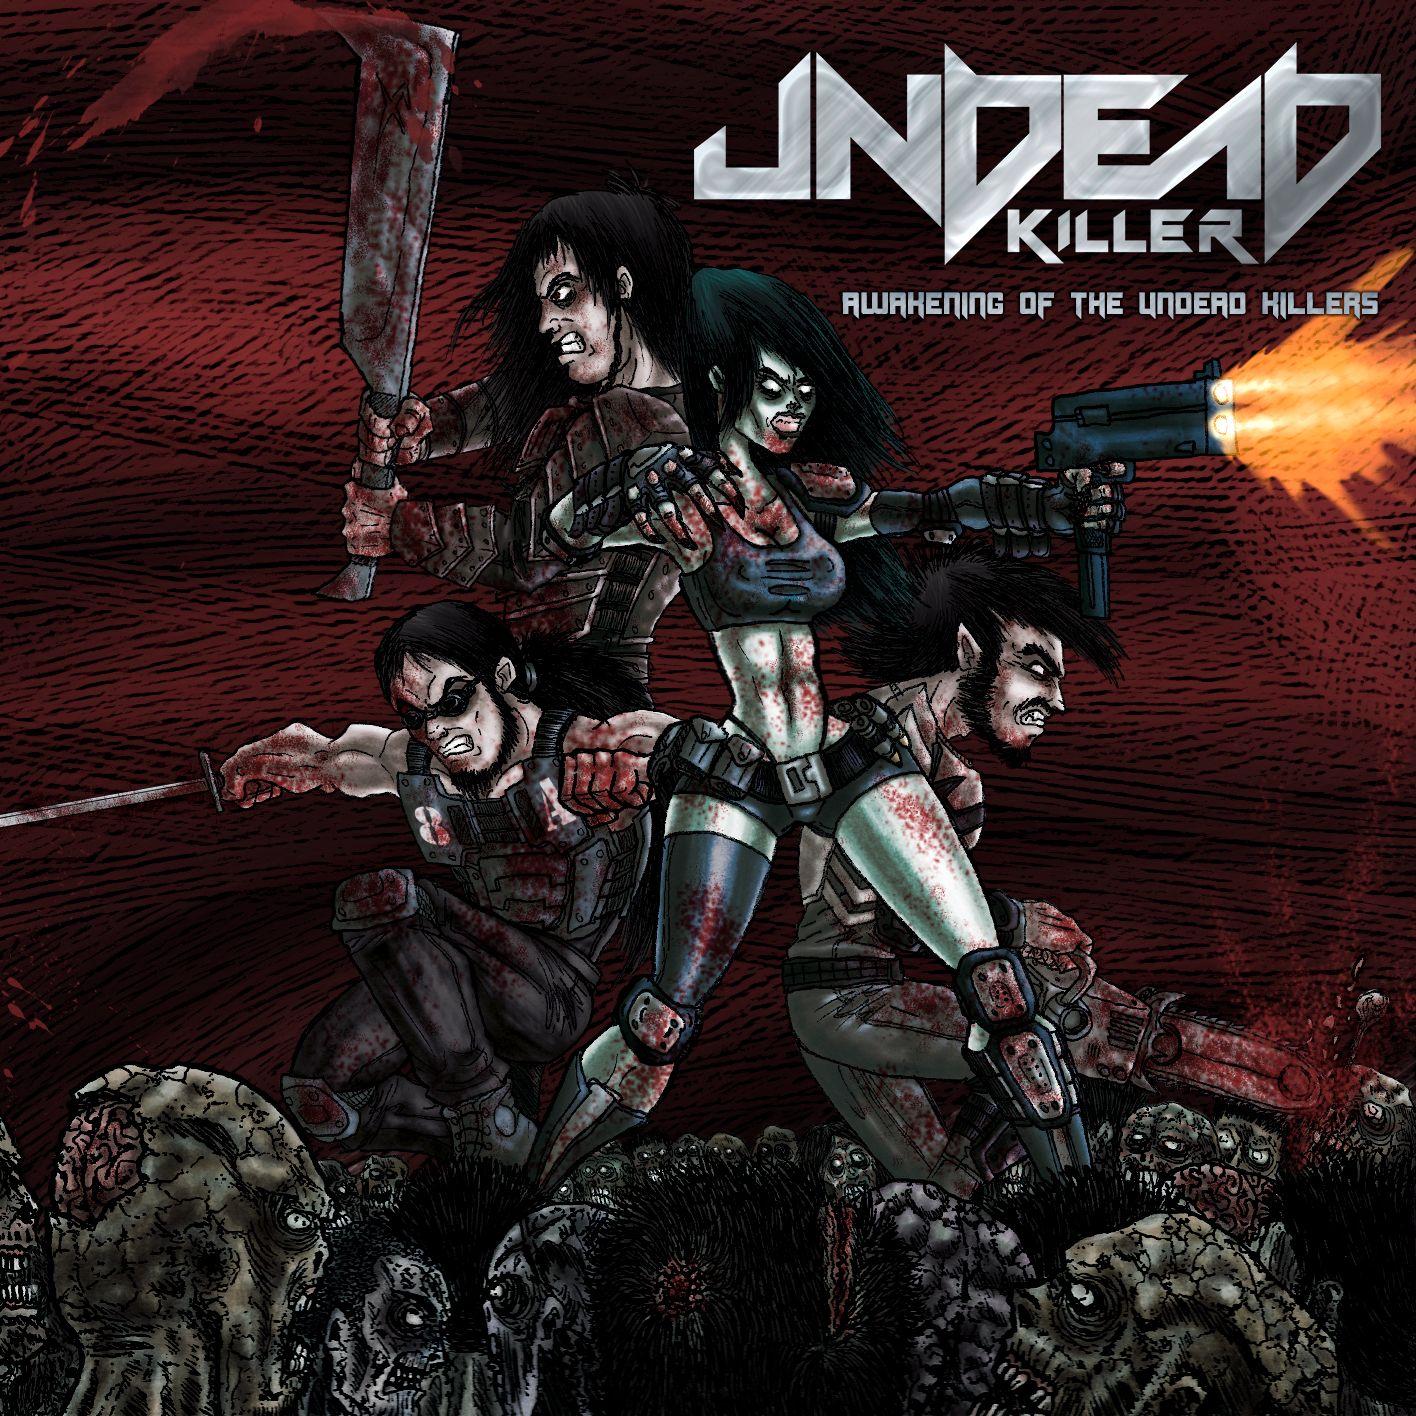 undead killer